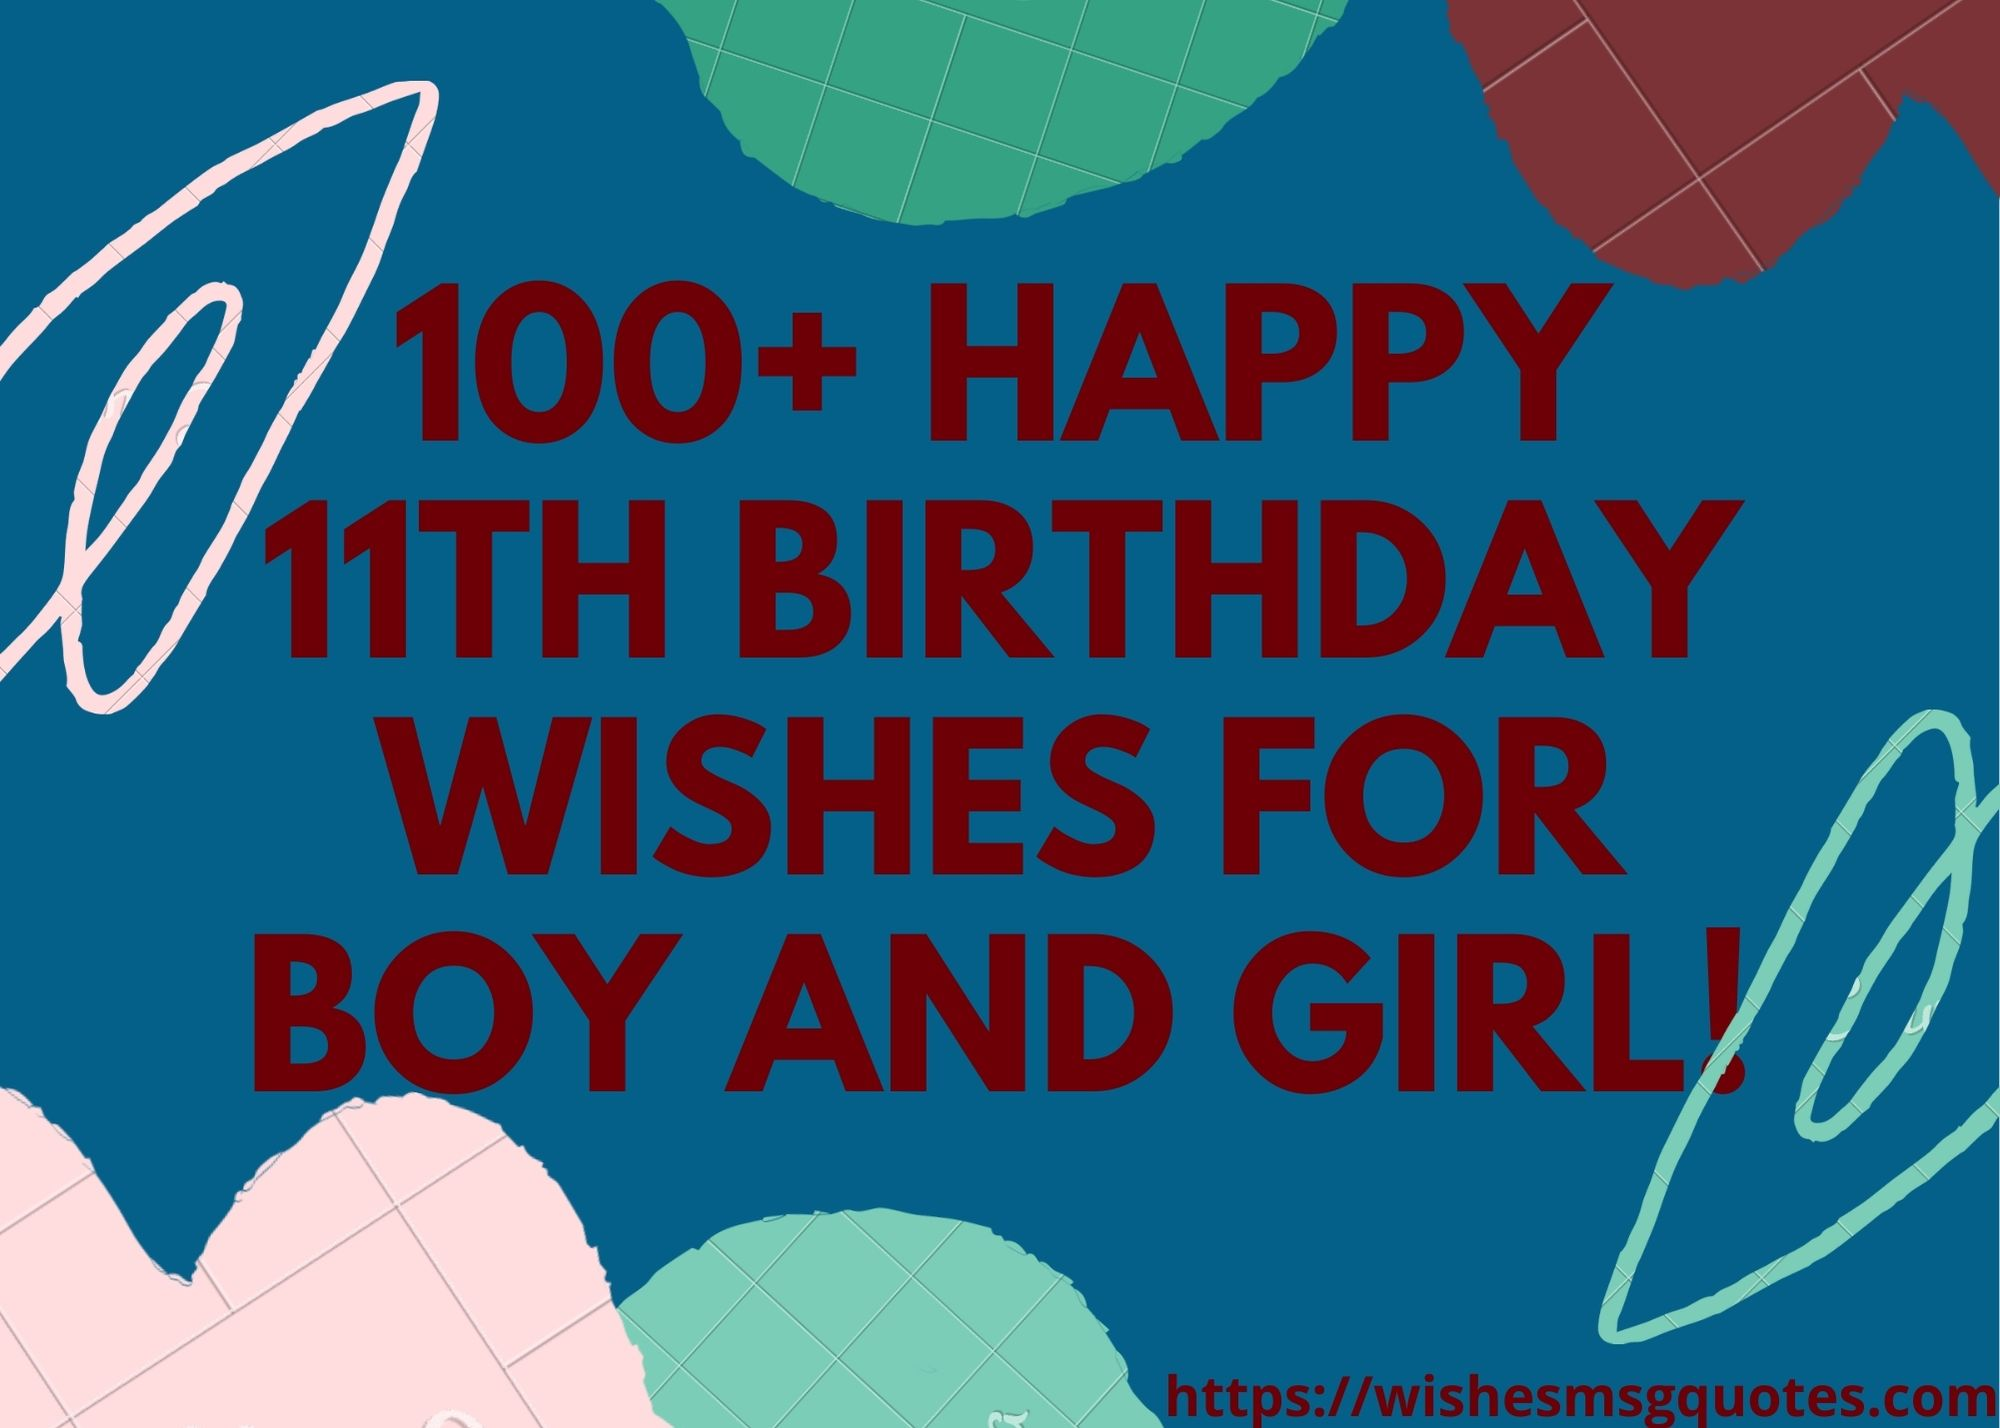 100+ Happy 11th Birthday Wishes For Boy & Girl